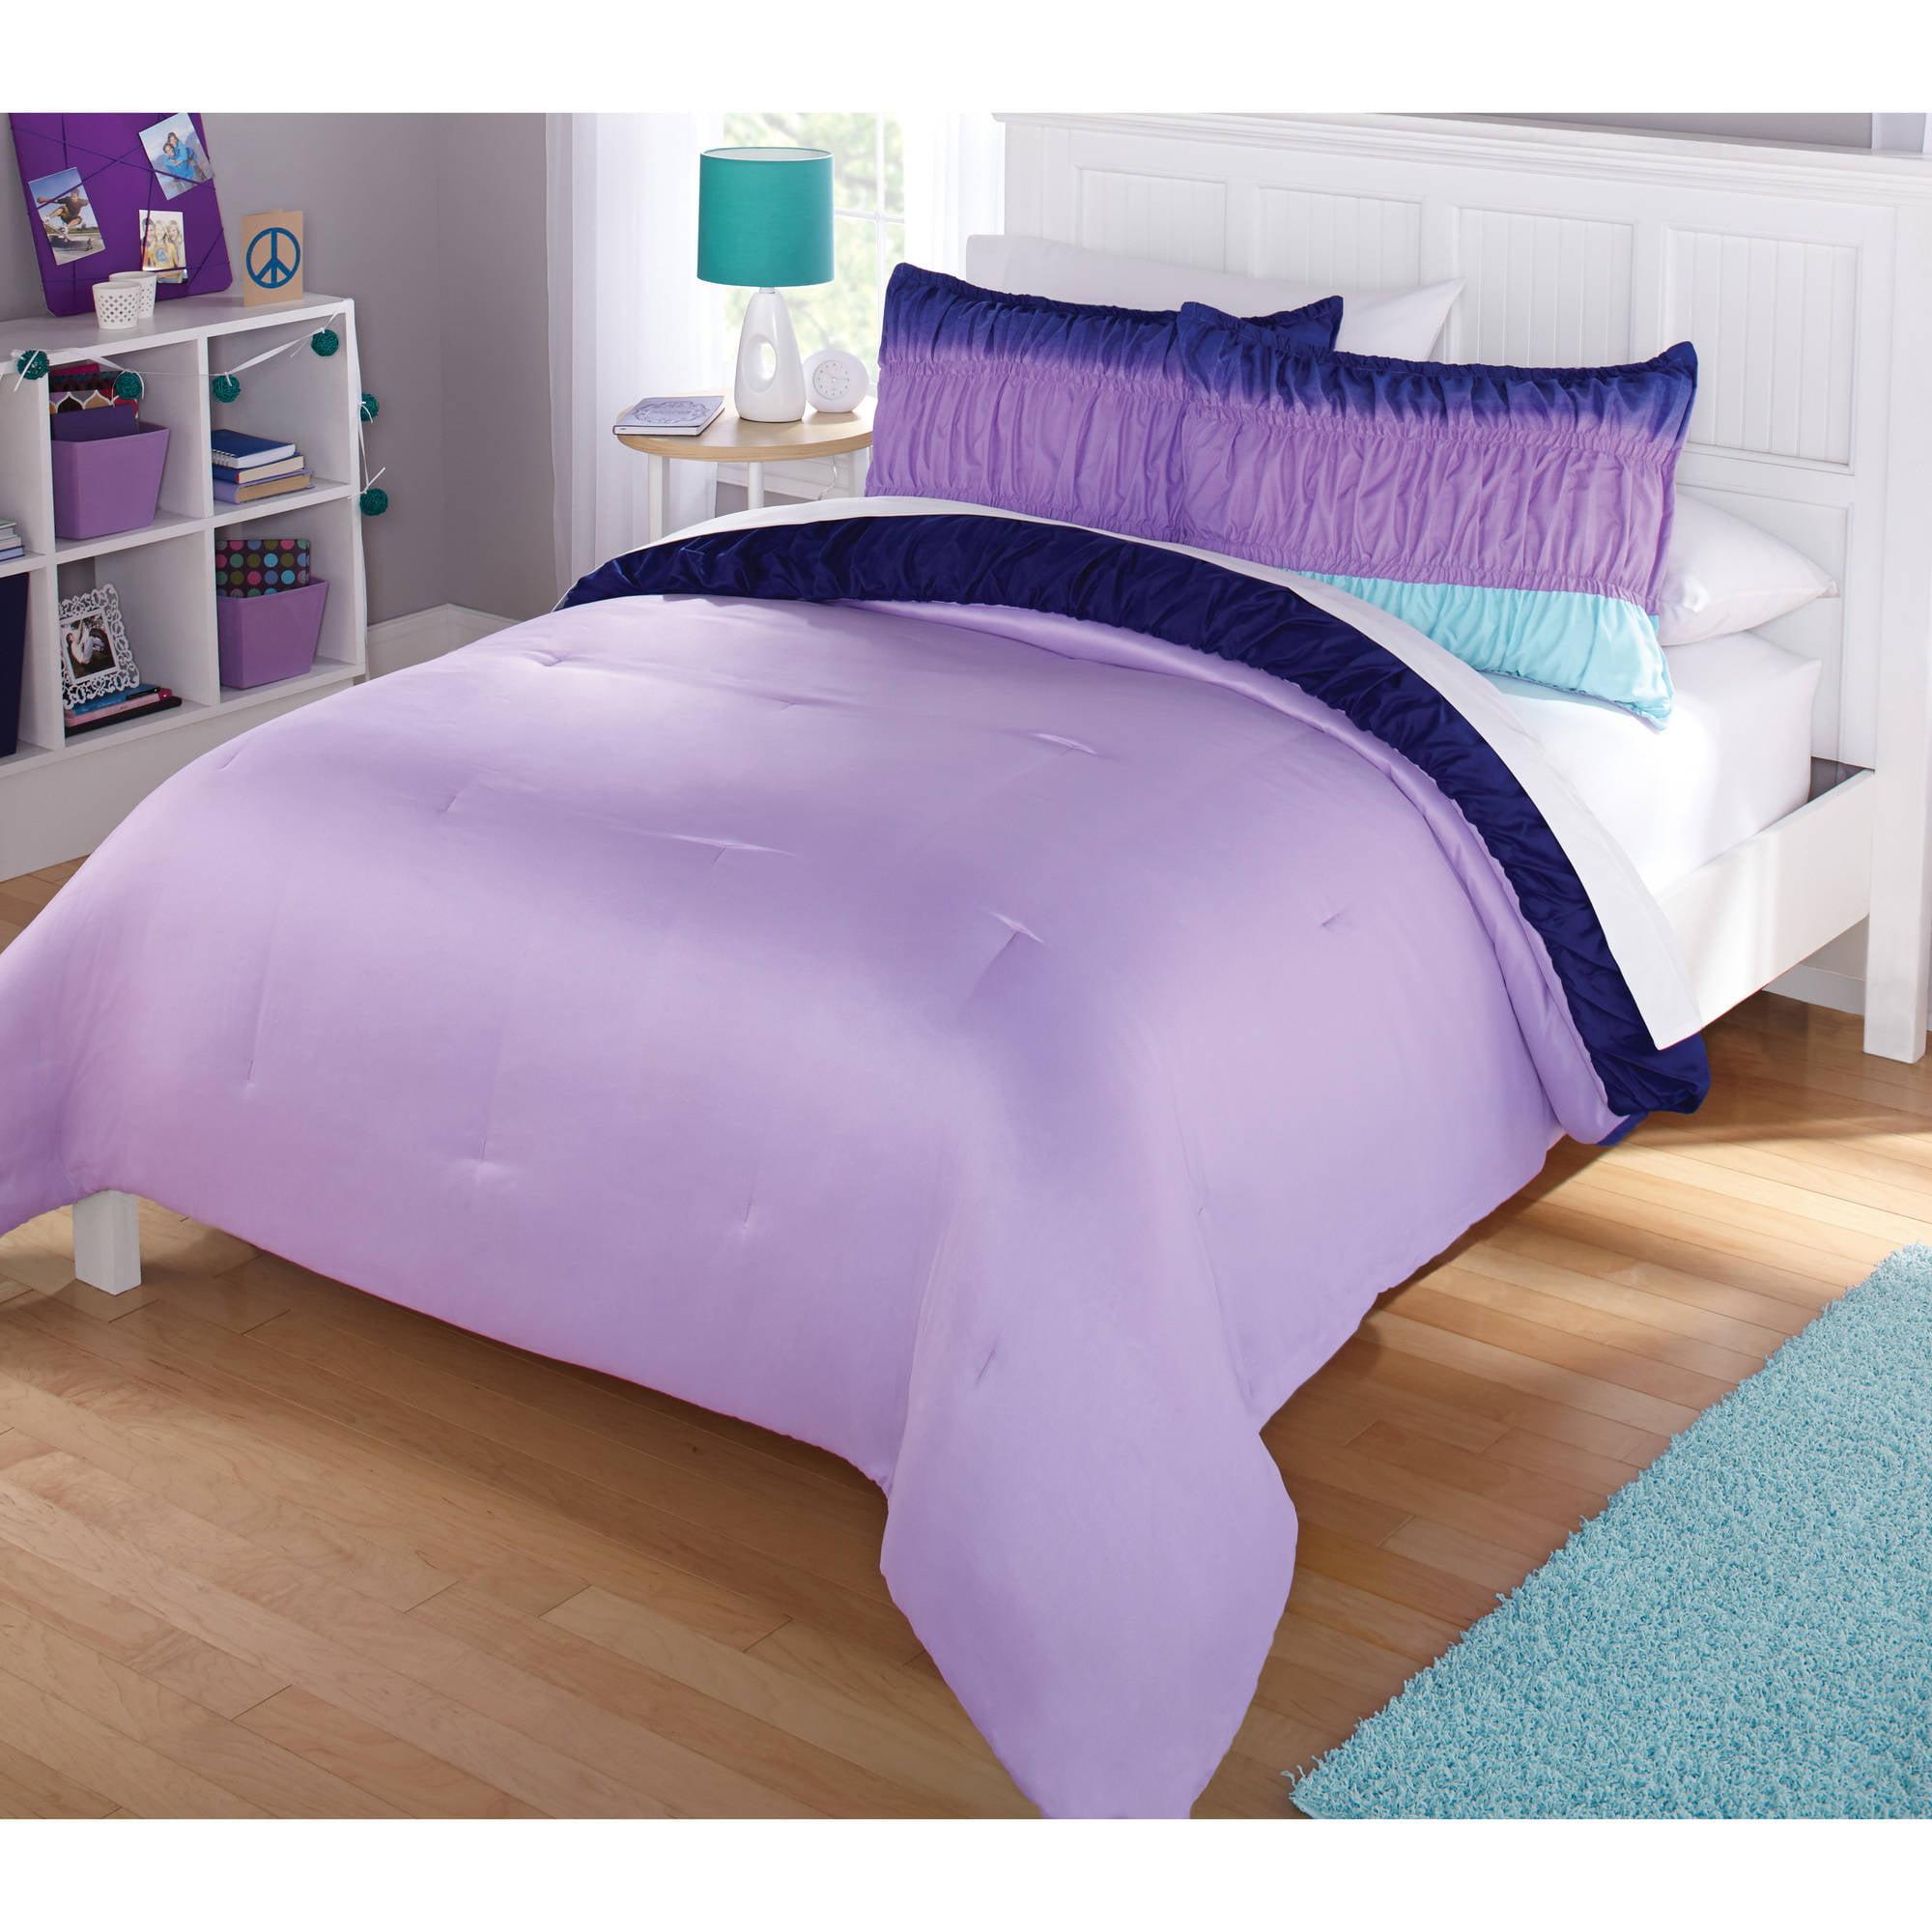 Bettwaren Wasche Matratzen Beautiful Fun Cozy Pink Blue Aqua Teal Purple Dog Puppy Girls Comforter Set Pandeglangkab Go Id